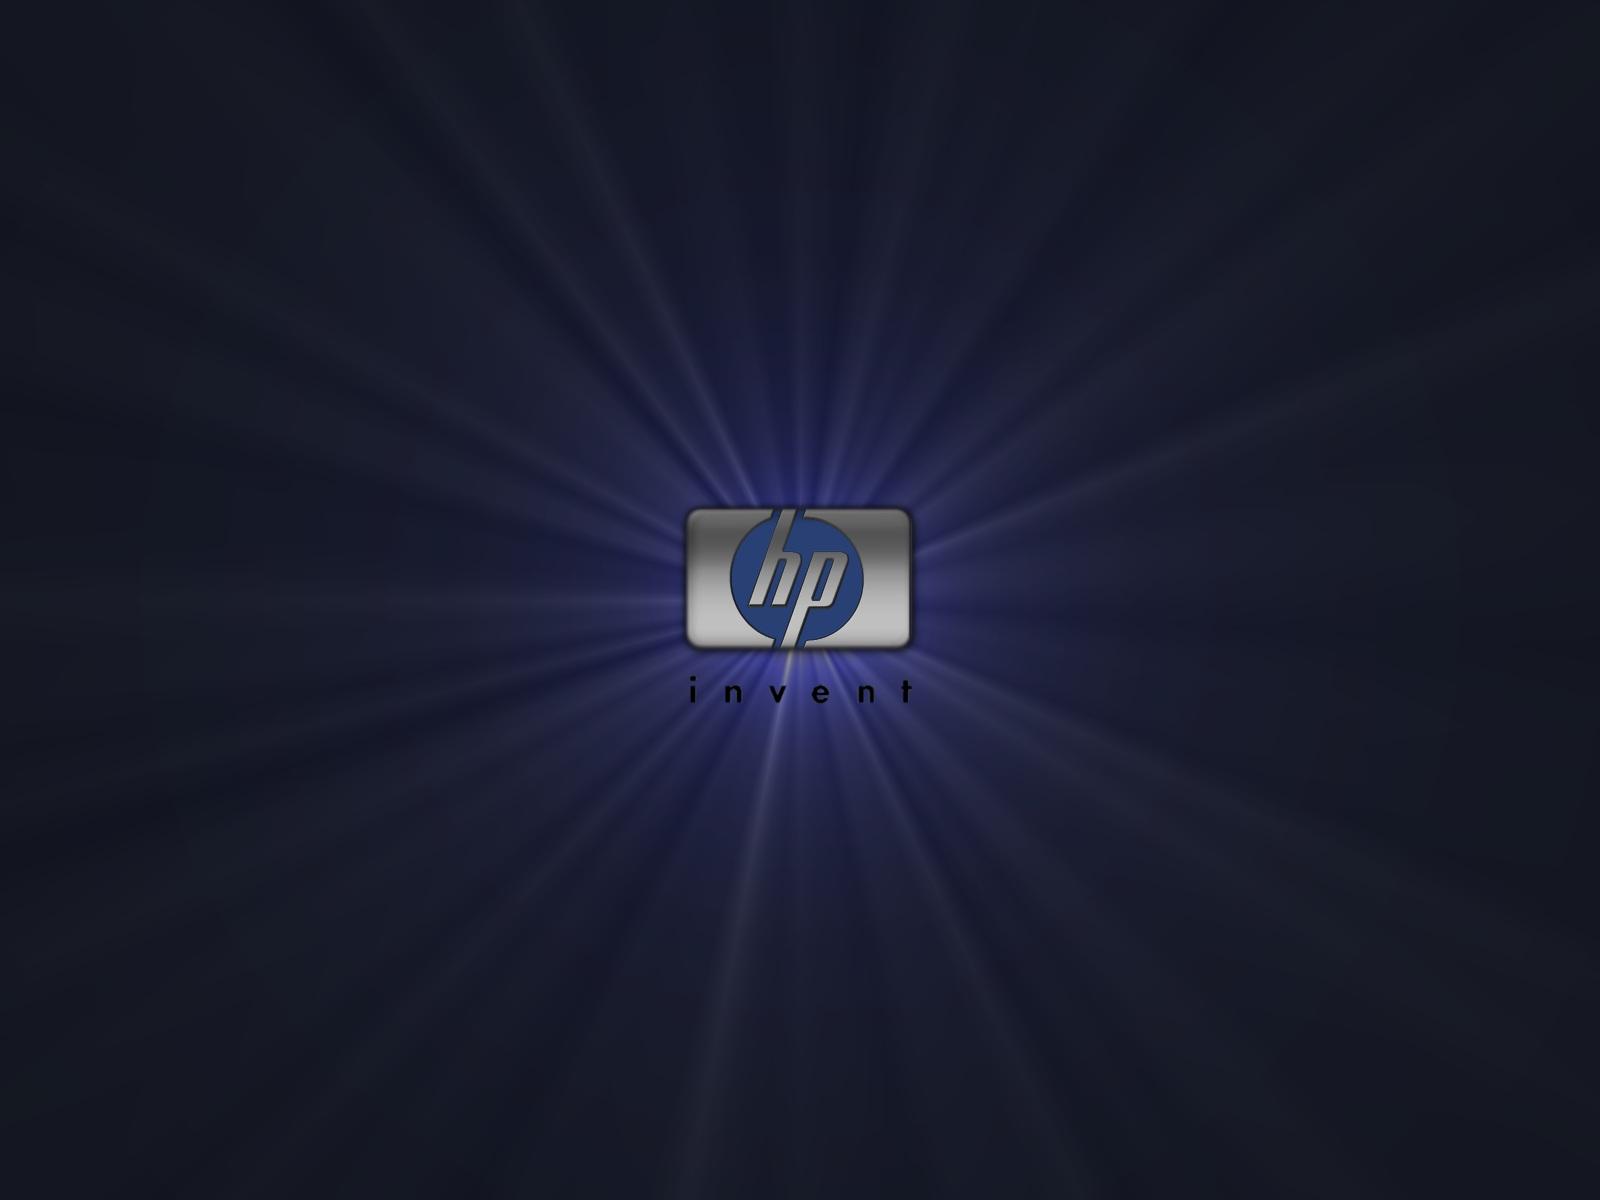 Hp notebook desktop - Background Laptop Wallpaper Nature Wallpaper For Hp Laptop